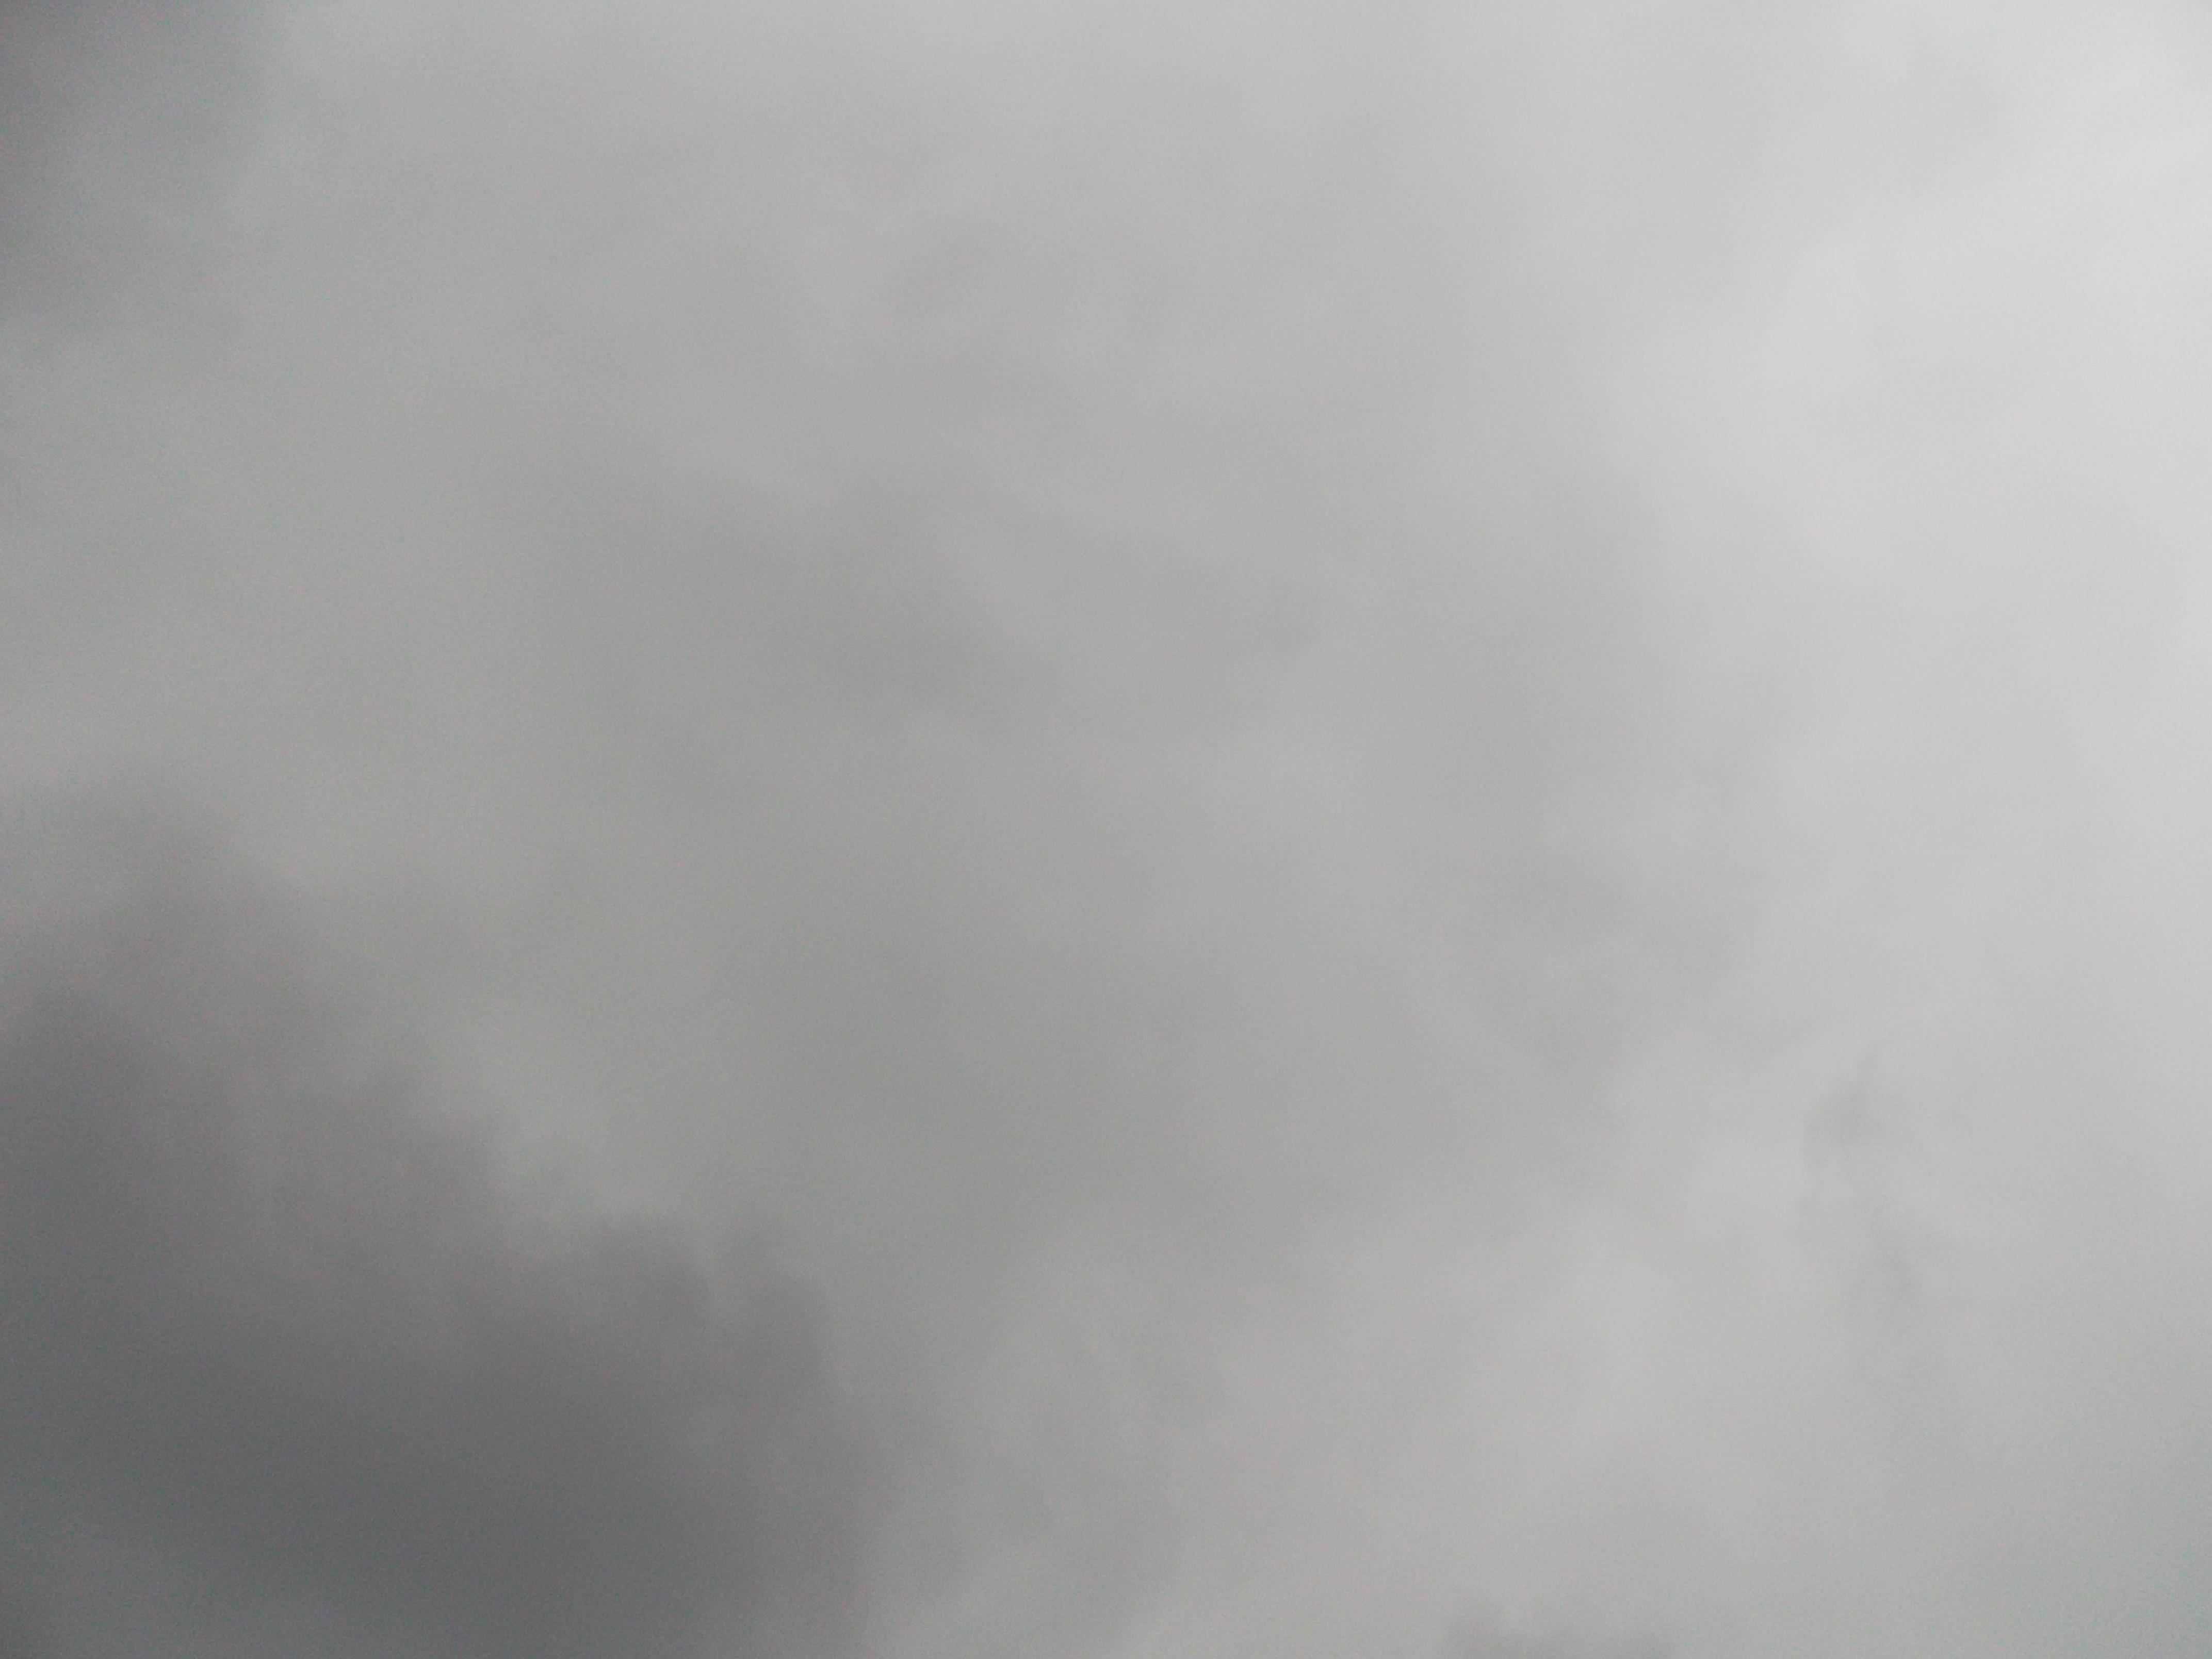 2013-02-10 Longitude -0.371 Latitude 49.182 Altitude 13 Heure 14h43